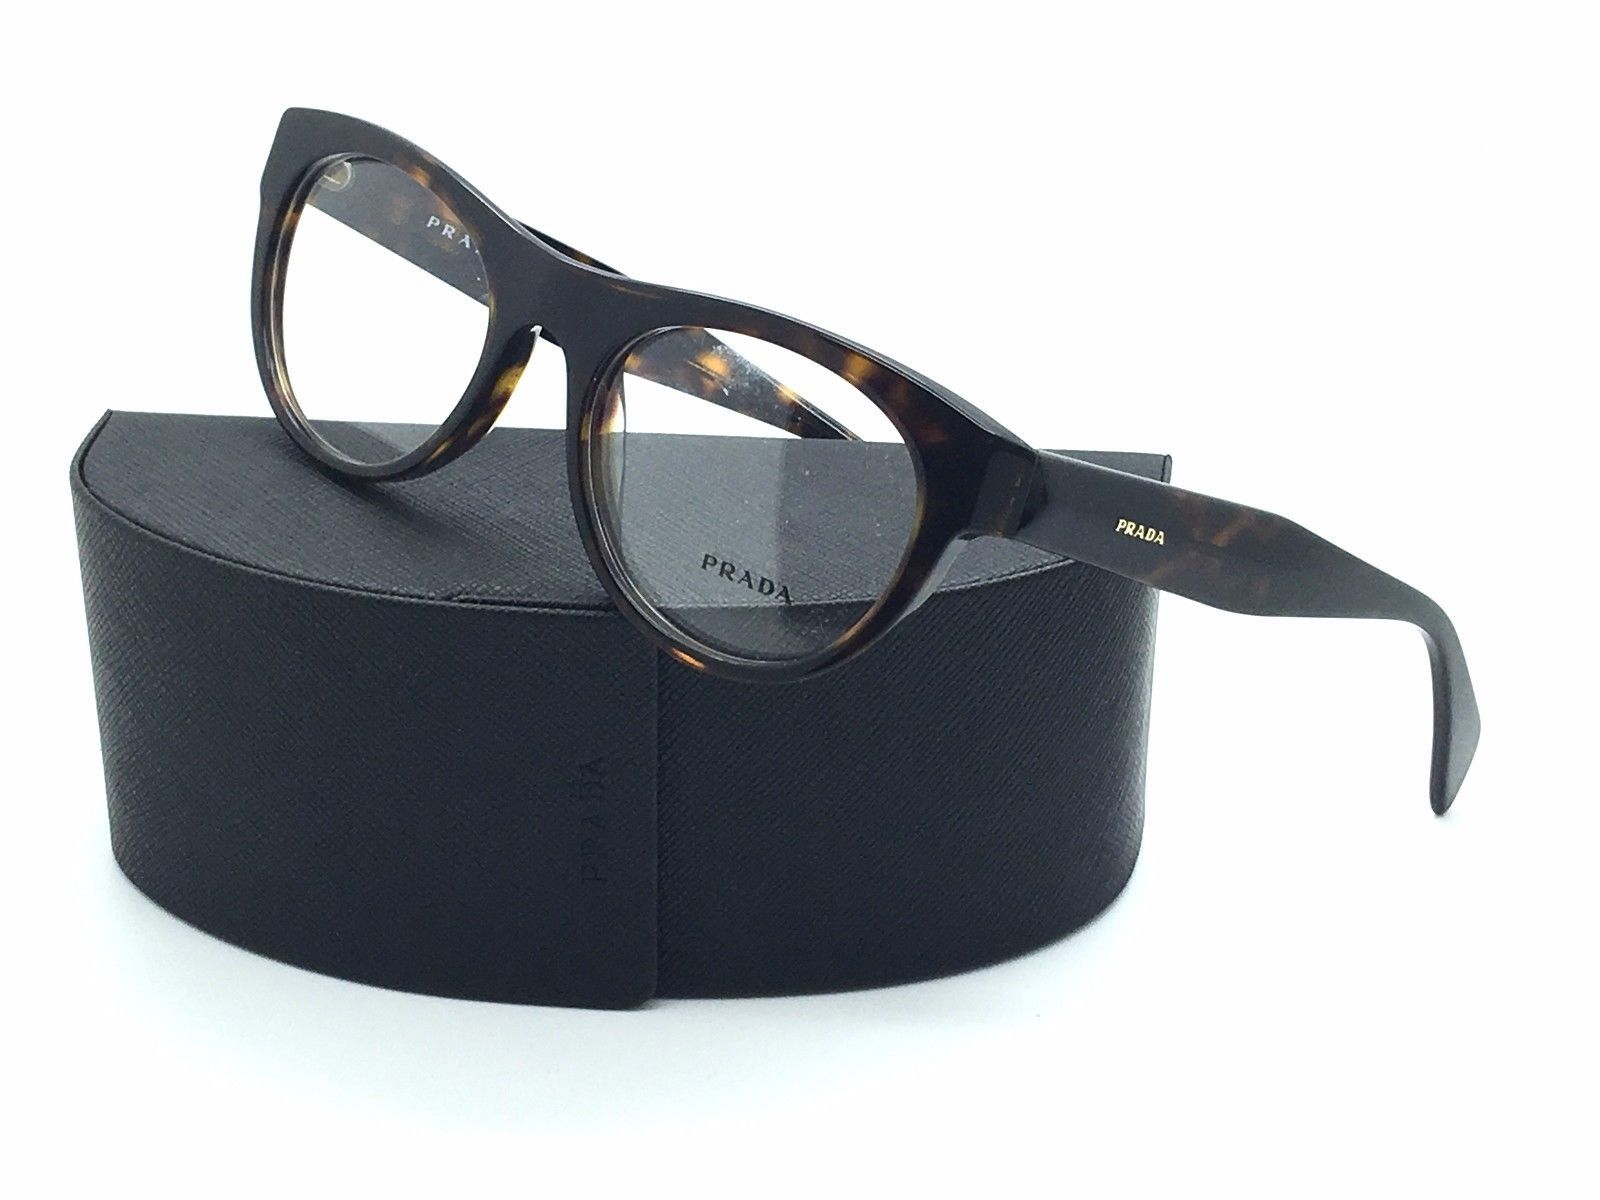 7ec4c928adc Prada Eyeglasses VPR 02Q 2AU-101 Havana and 20 similar items. 57